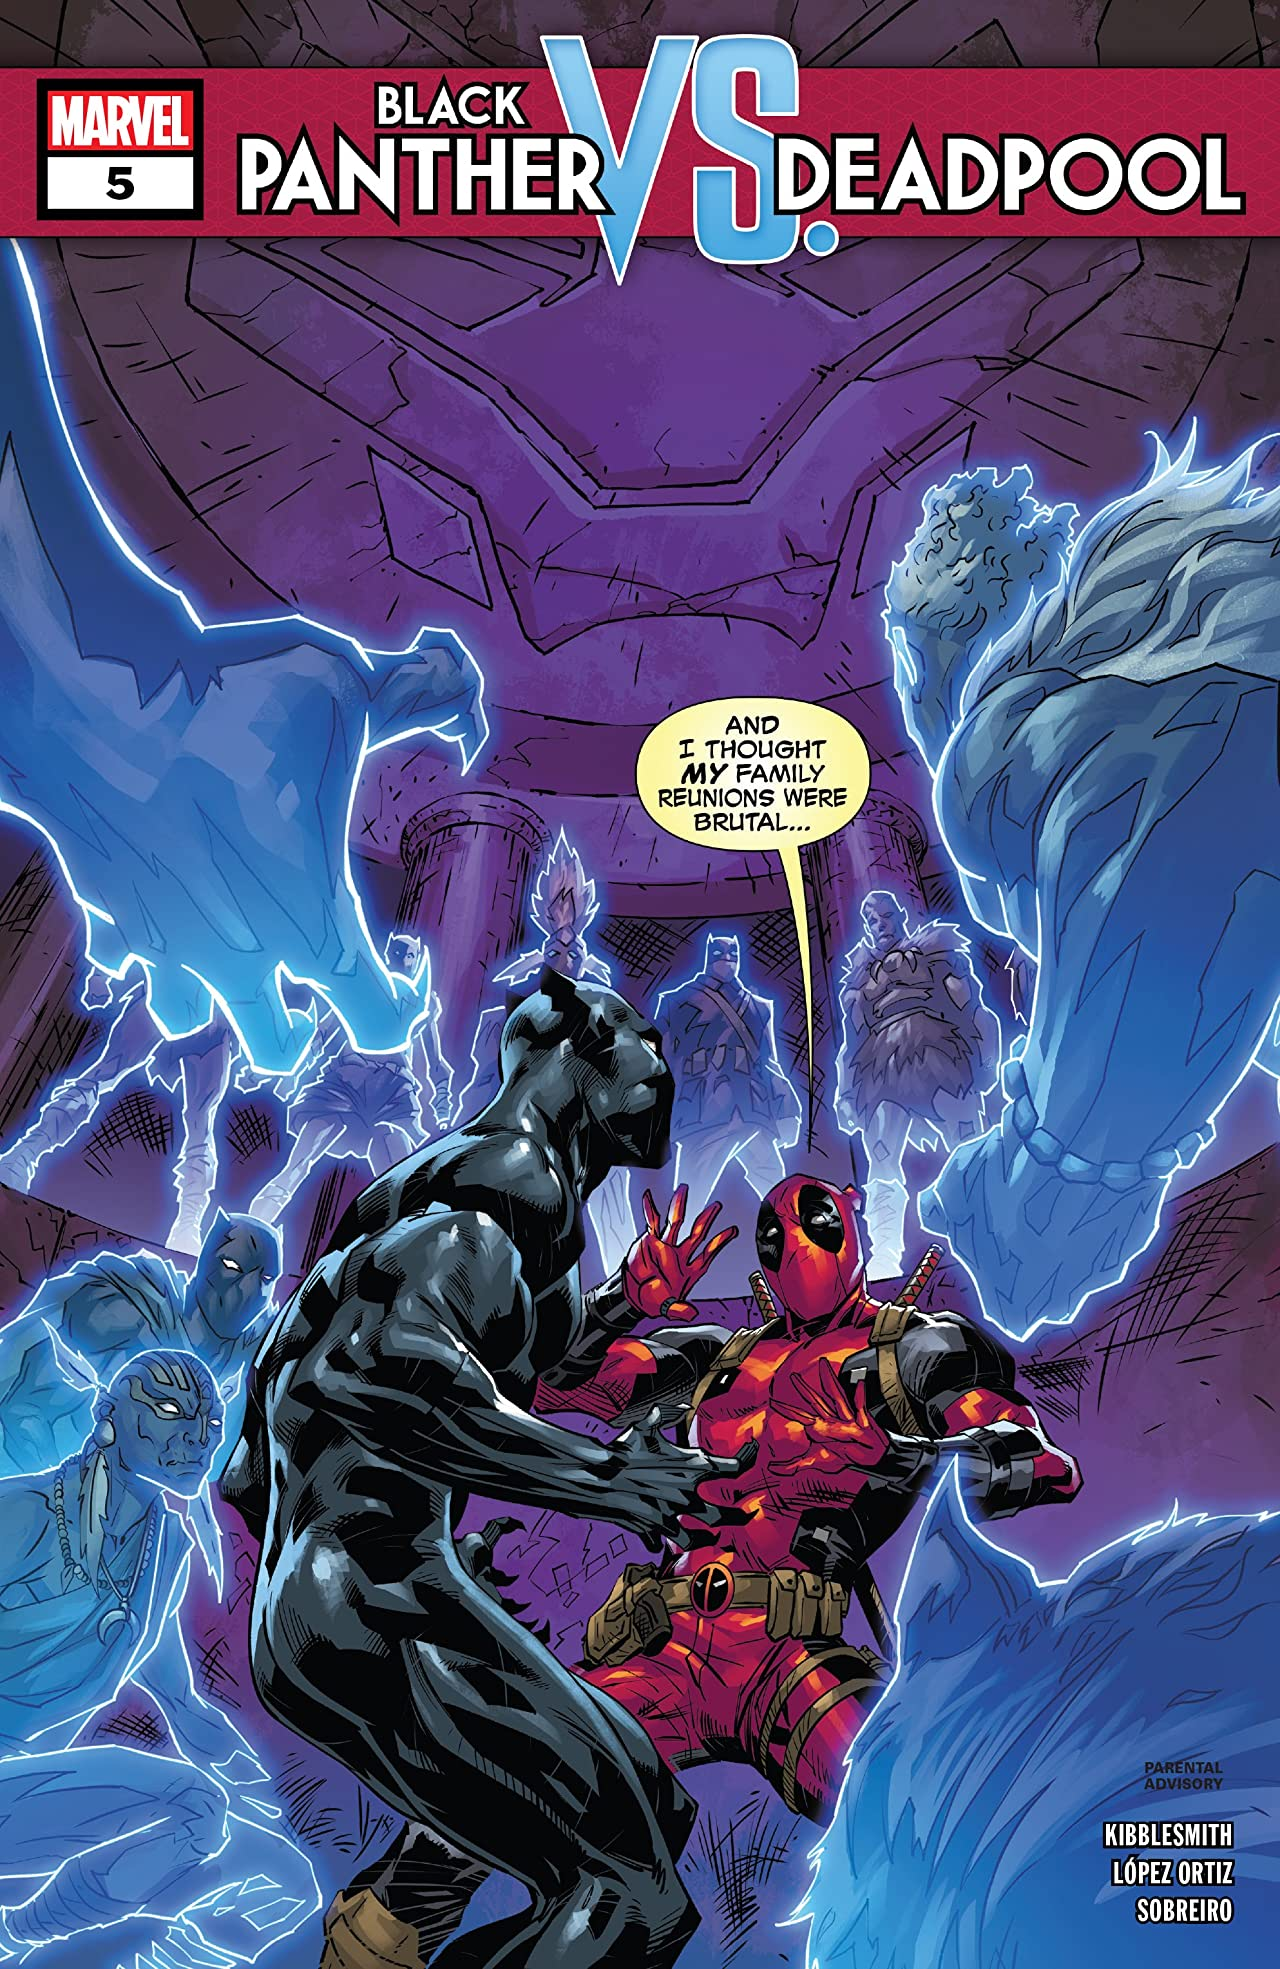 Black Panther vs. Deadpool (2018-2019) #5 (of 5)